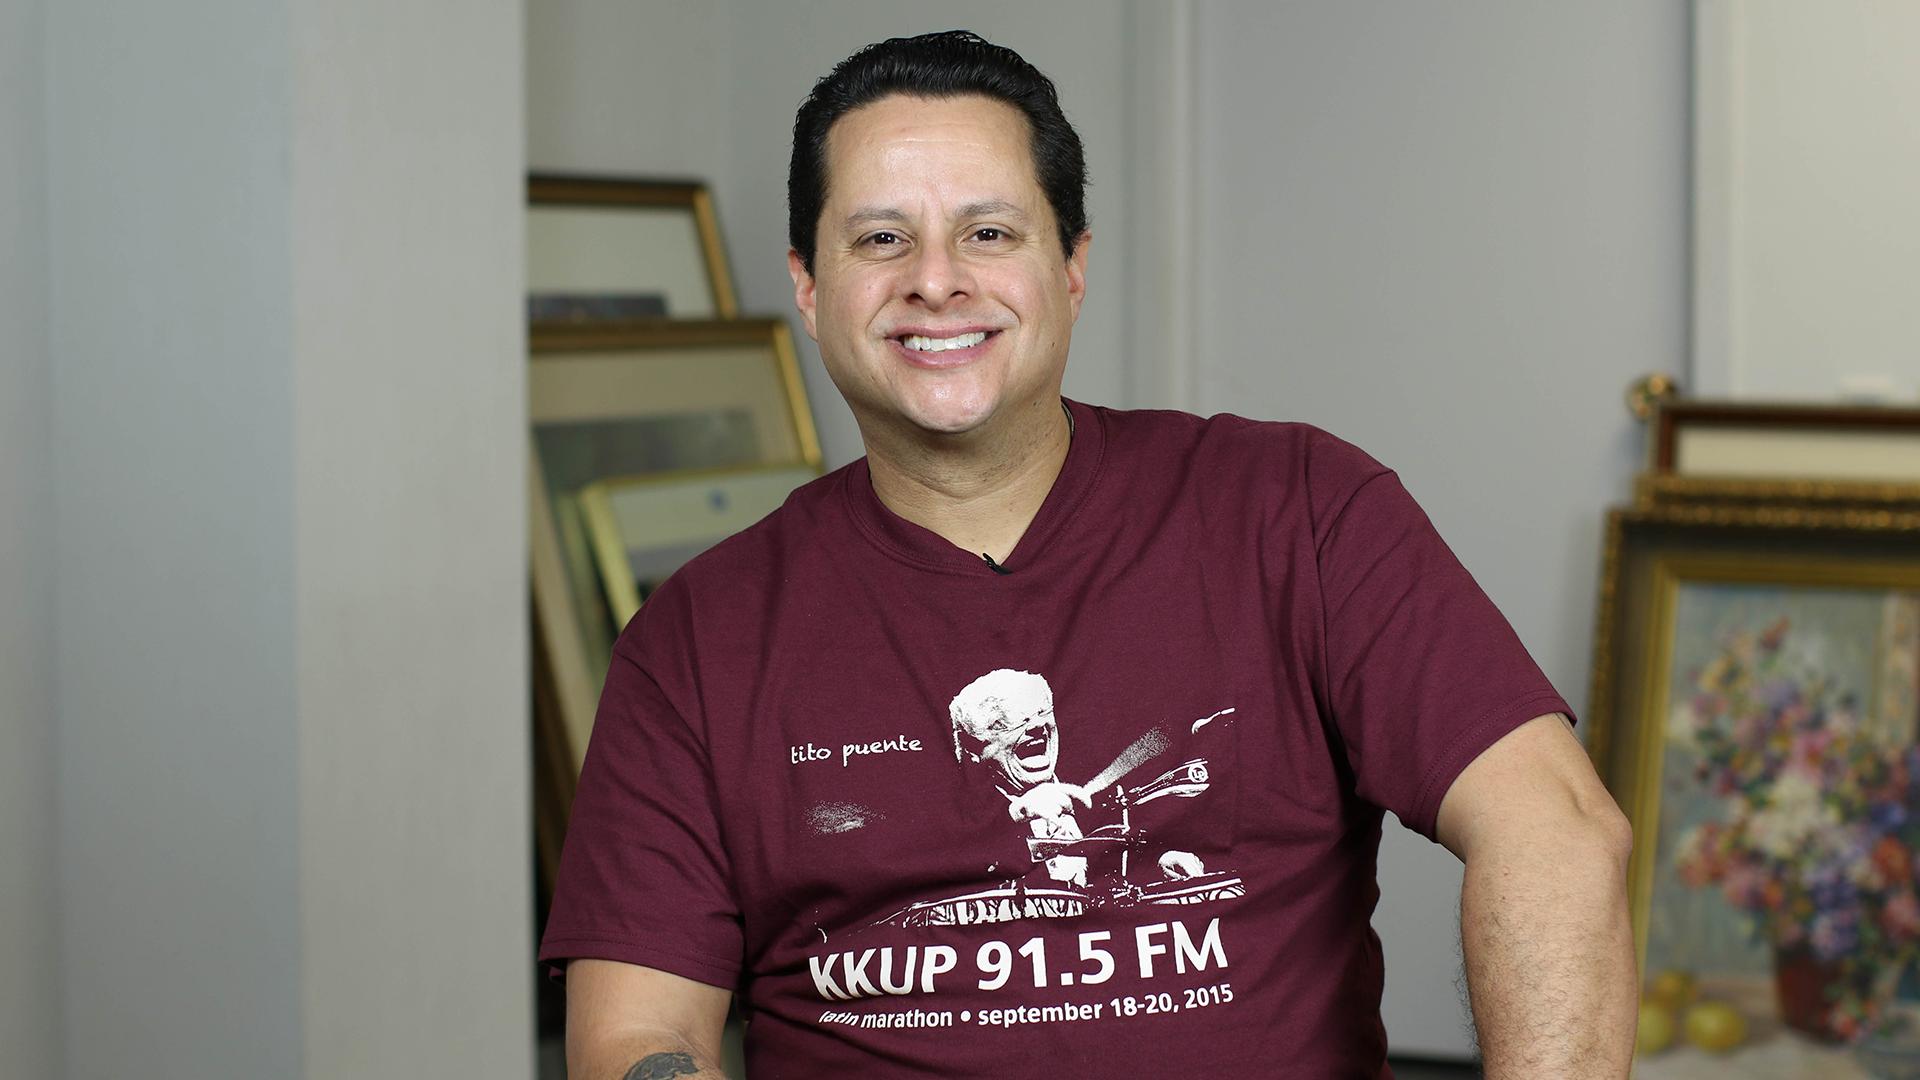 Tito Puente Jr. — Photo Credit: Shefik